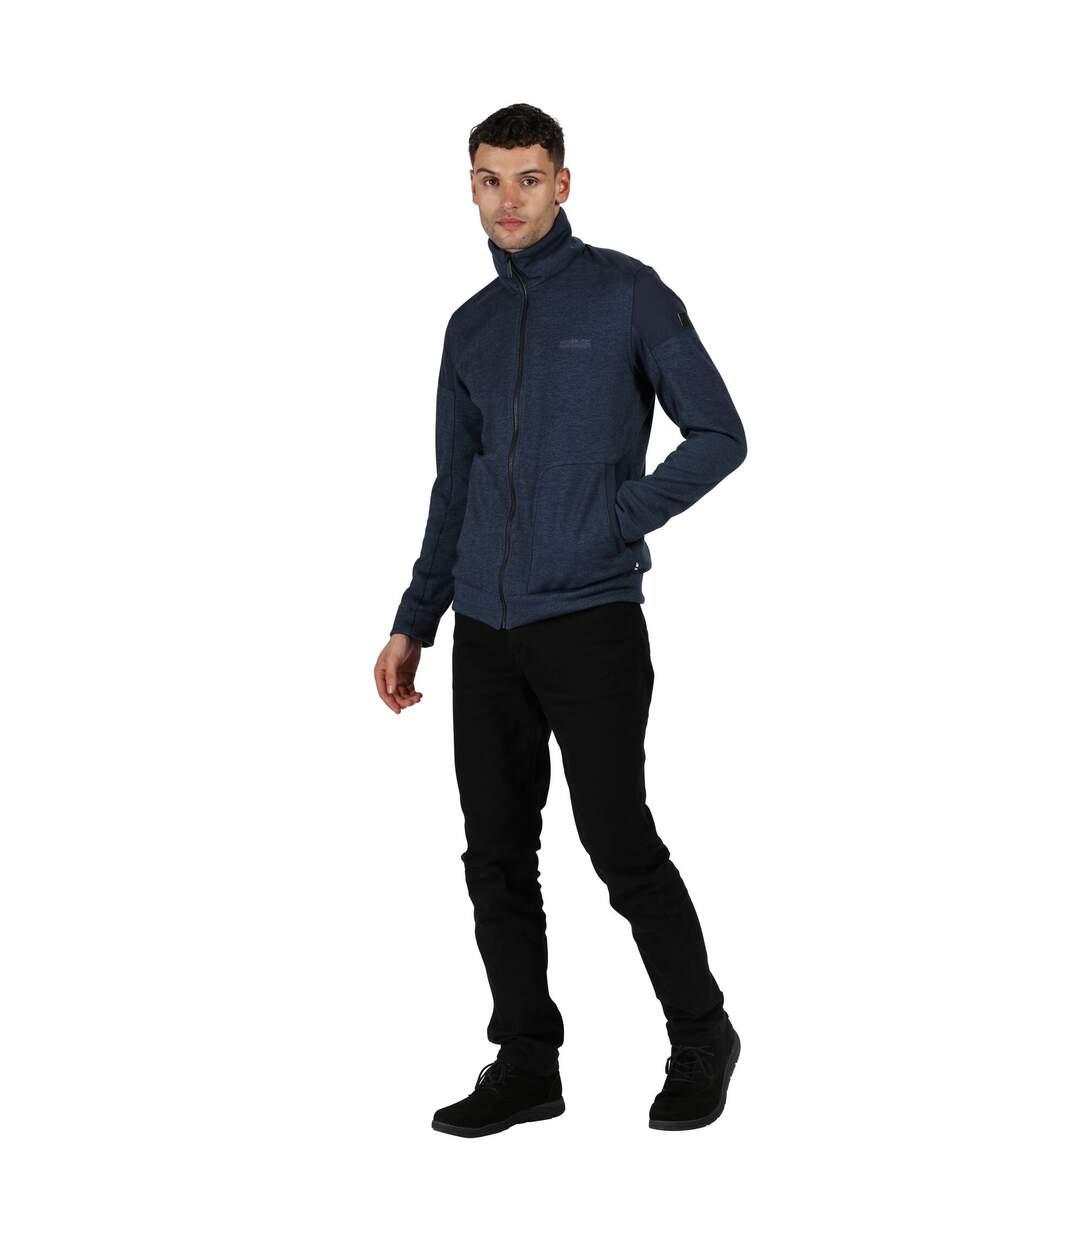 Regatta Mens Carlyle Full Zip Heavyweight Fleece (Dark Denim/Navy) - UTRG4942